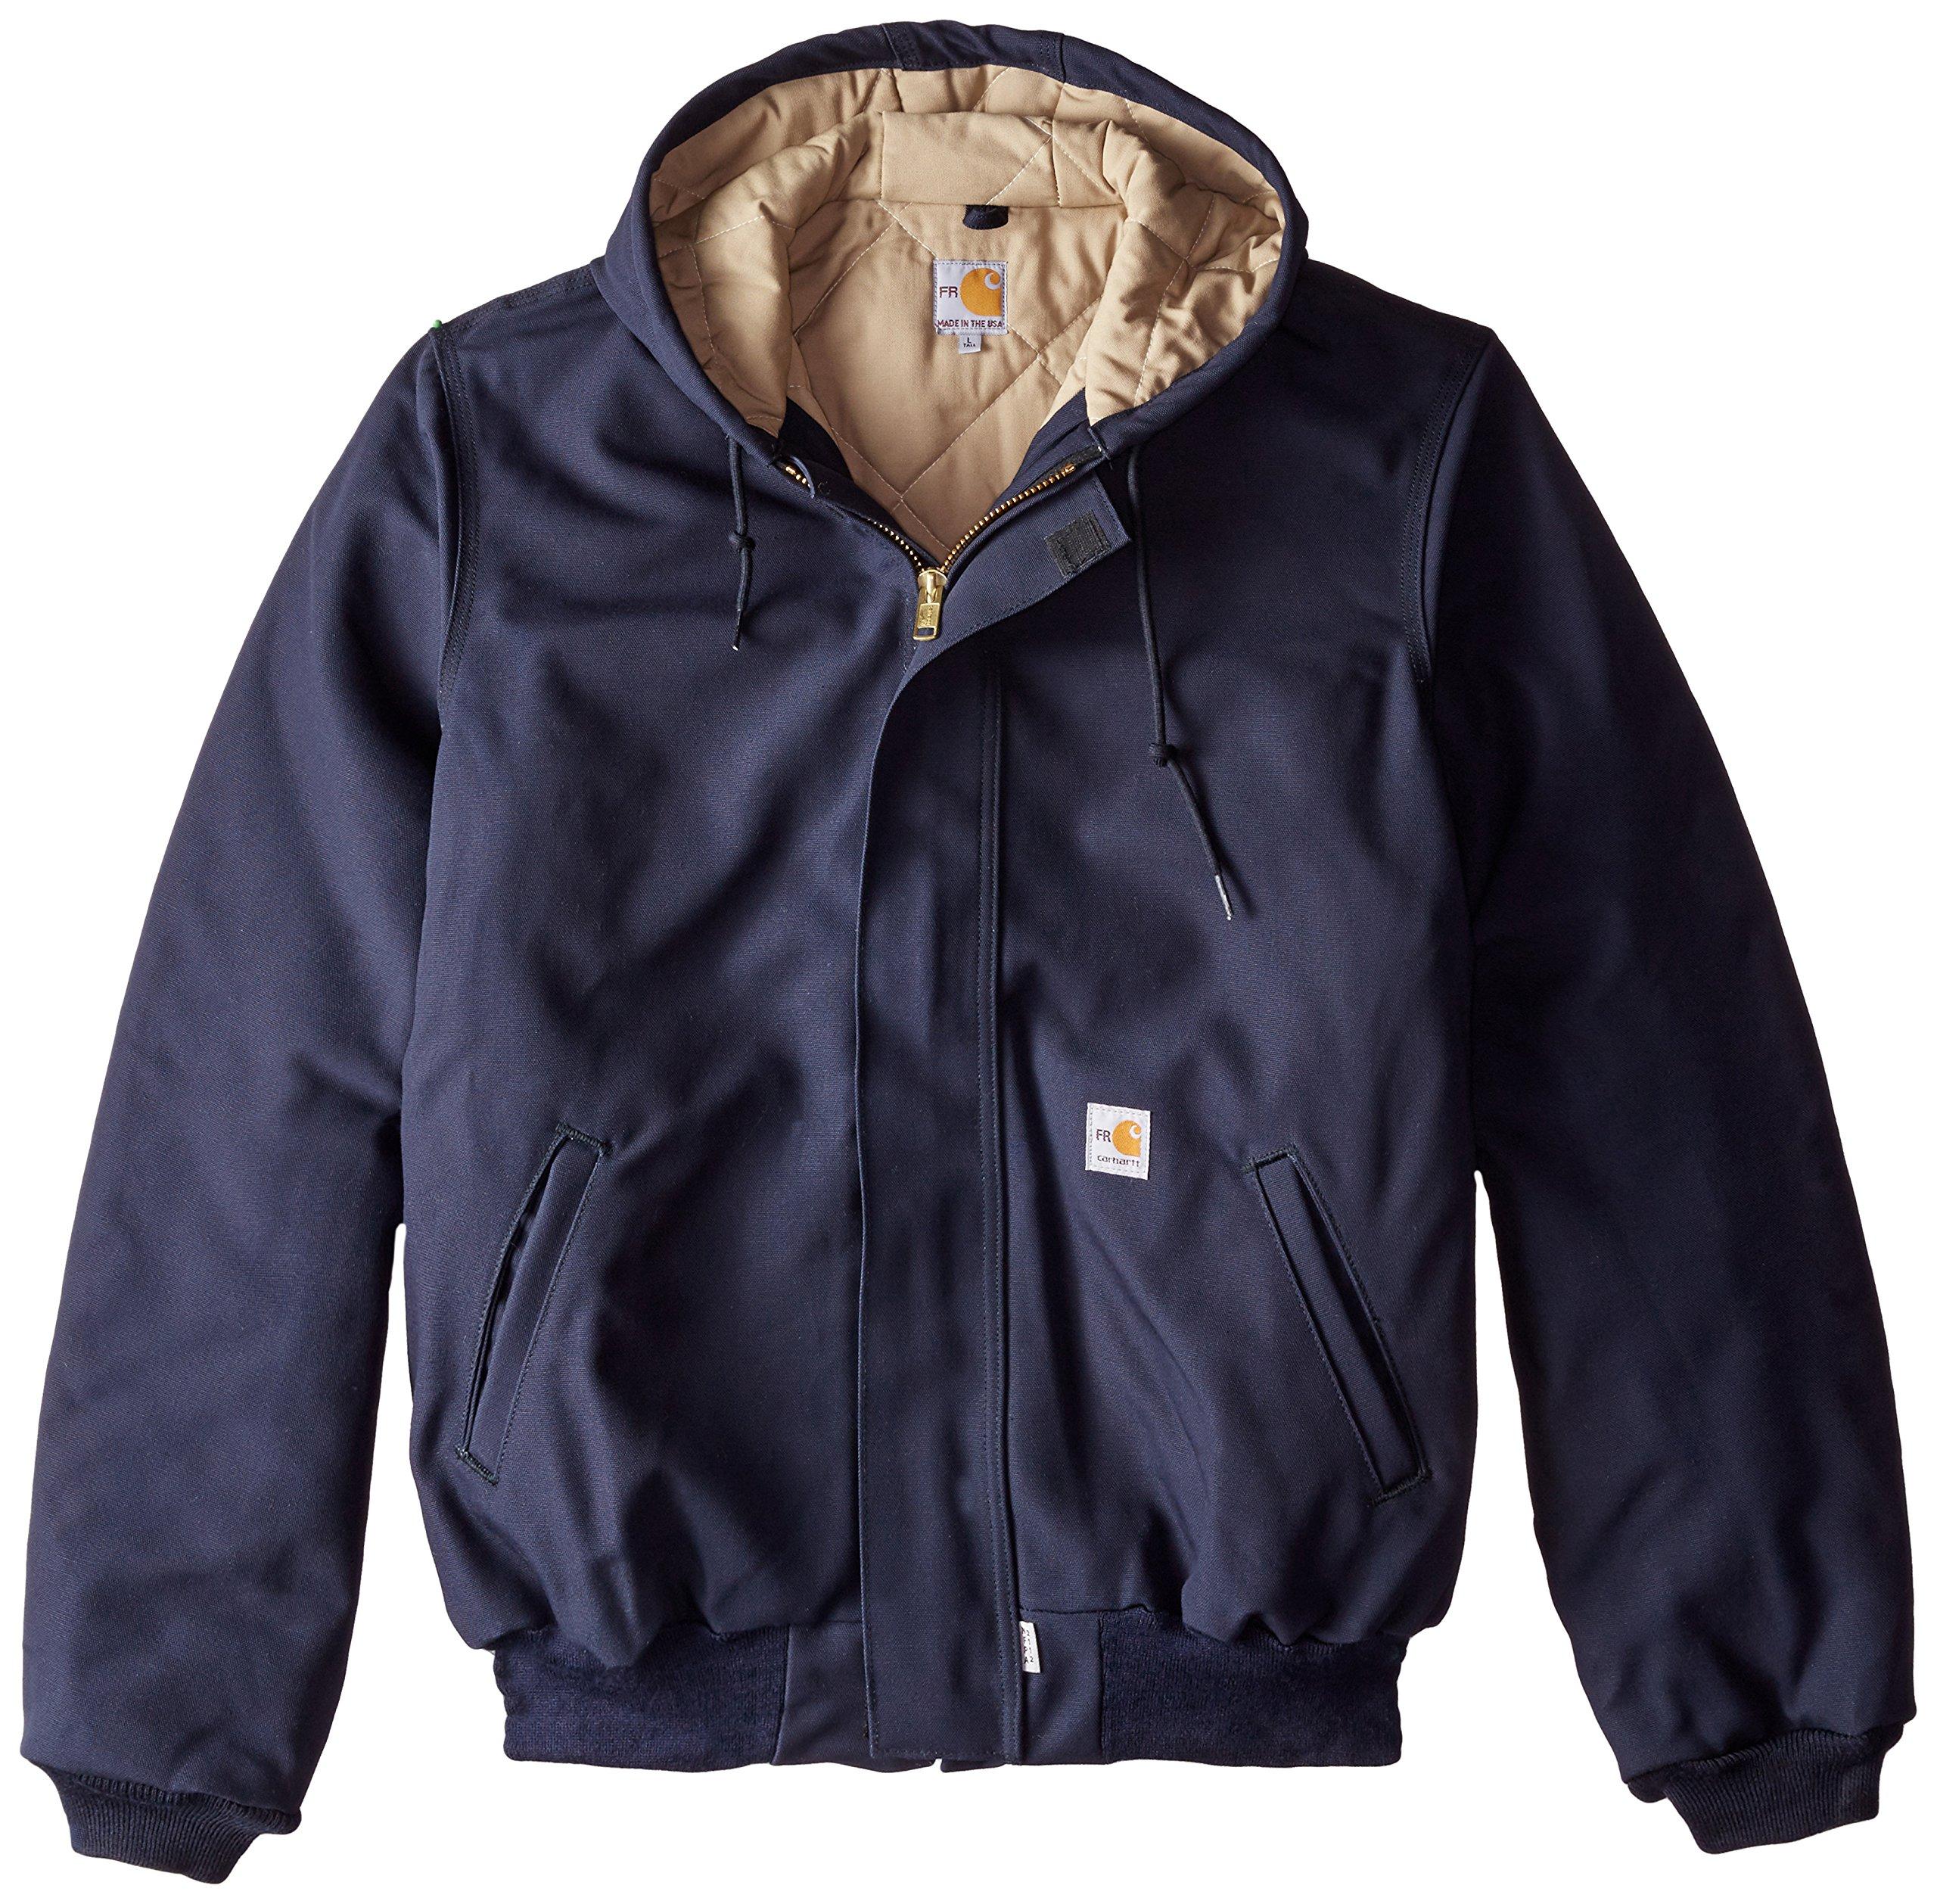 Carhartt Men's Big & Tall Flame Resistant Duck Active Jacket,Dark Navy,3X-Large/Tall